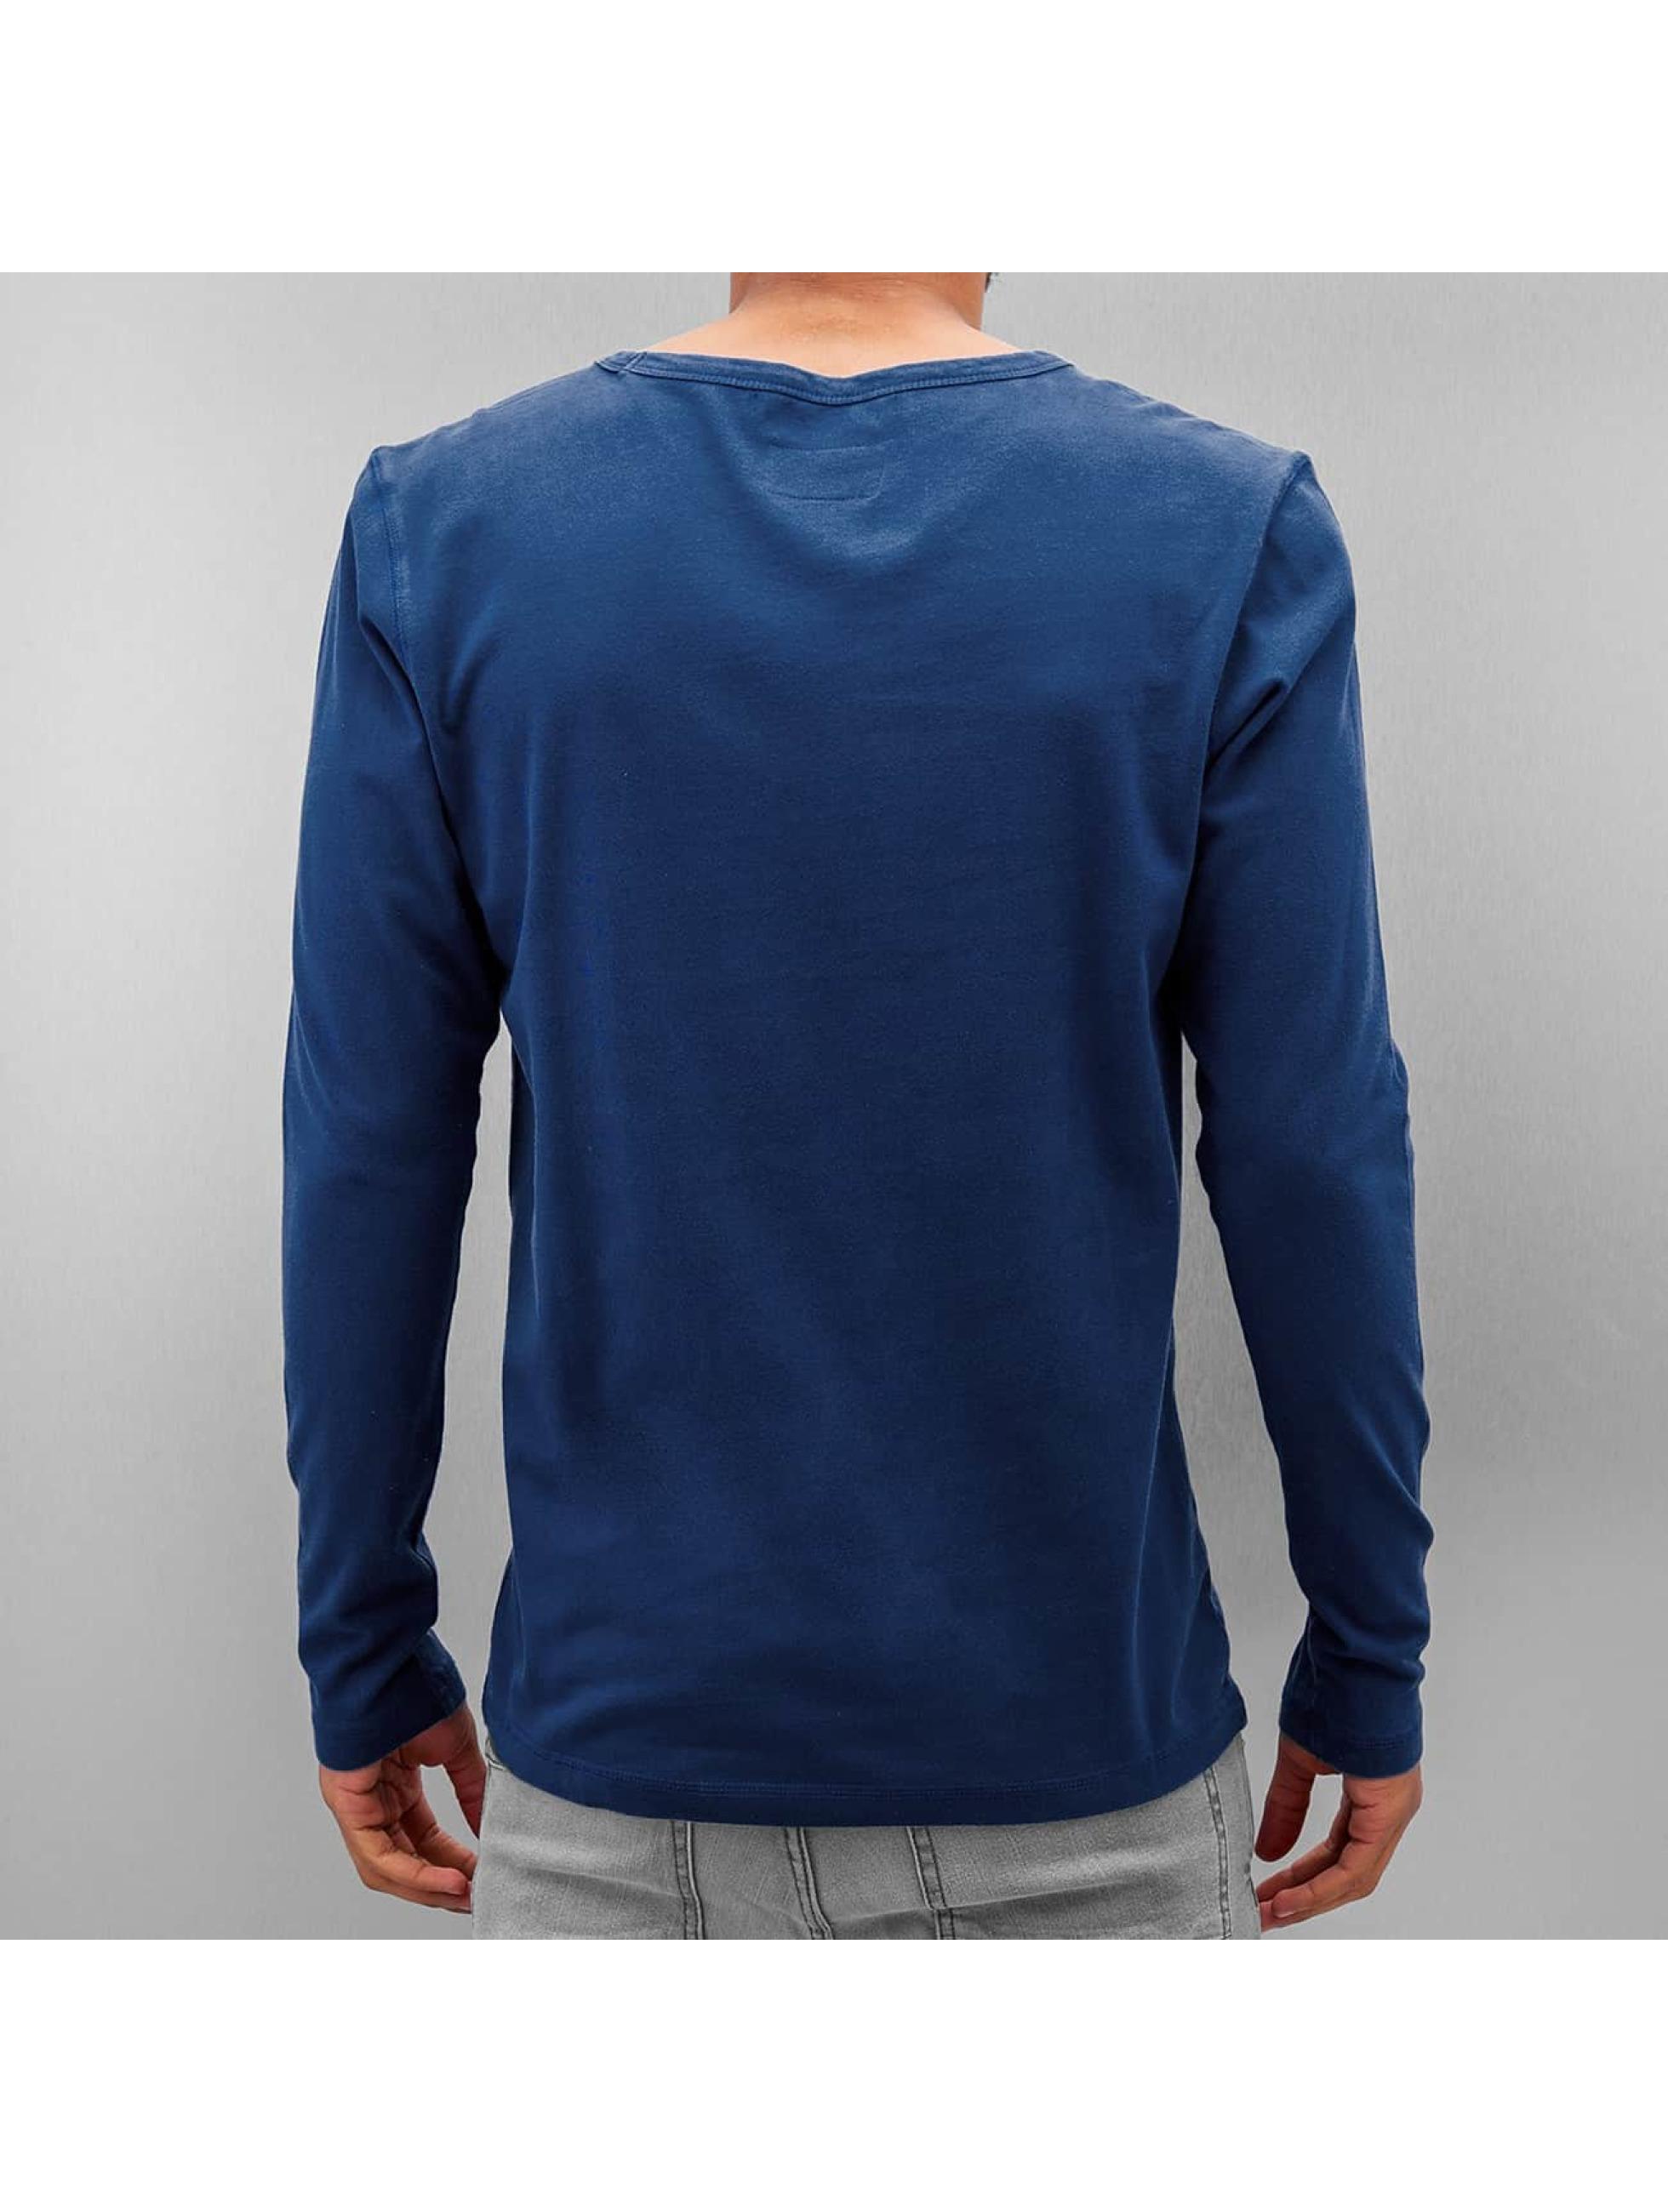 Amsterdenim Camiseta de manga larga Nelis azul